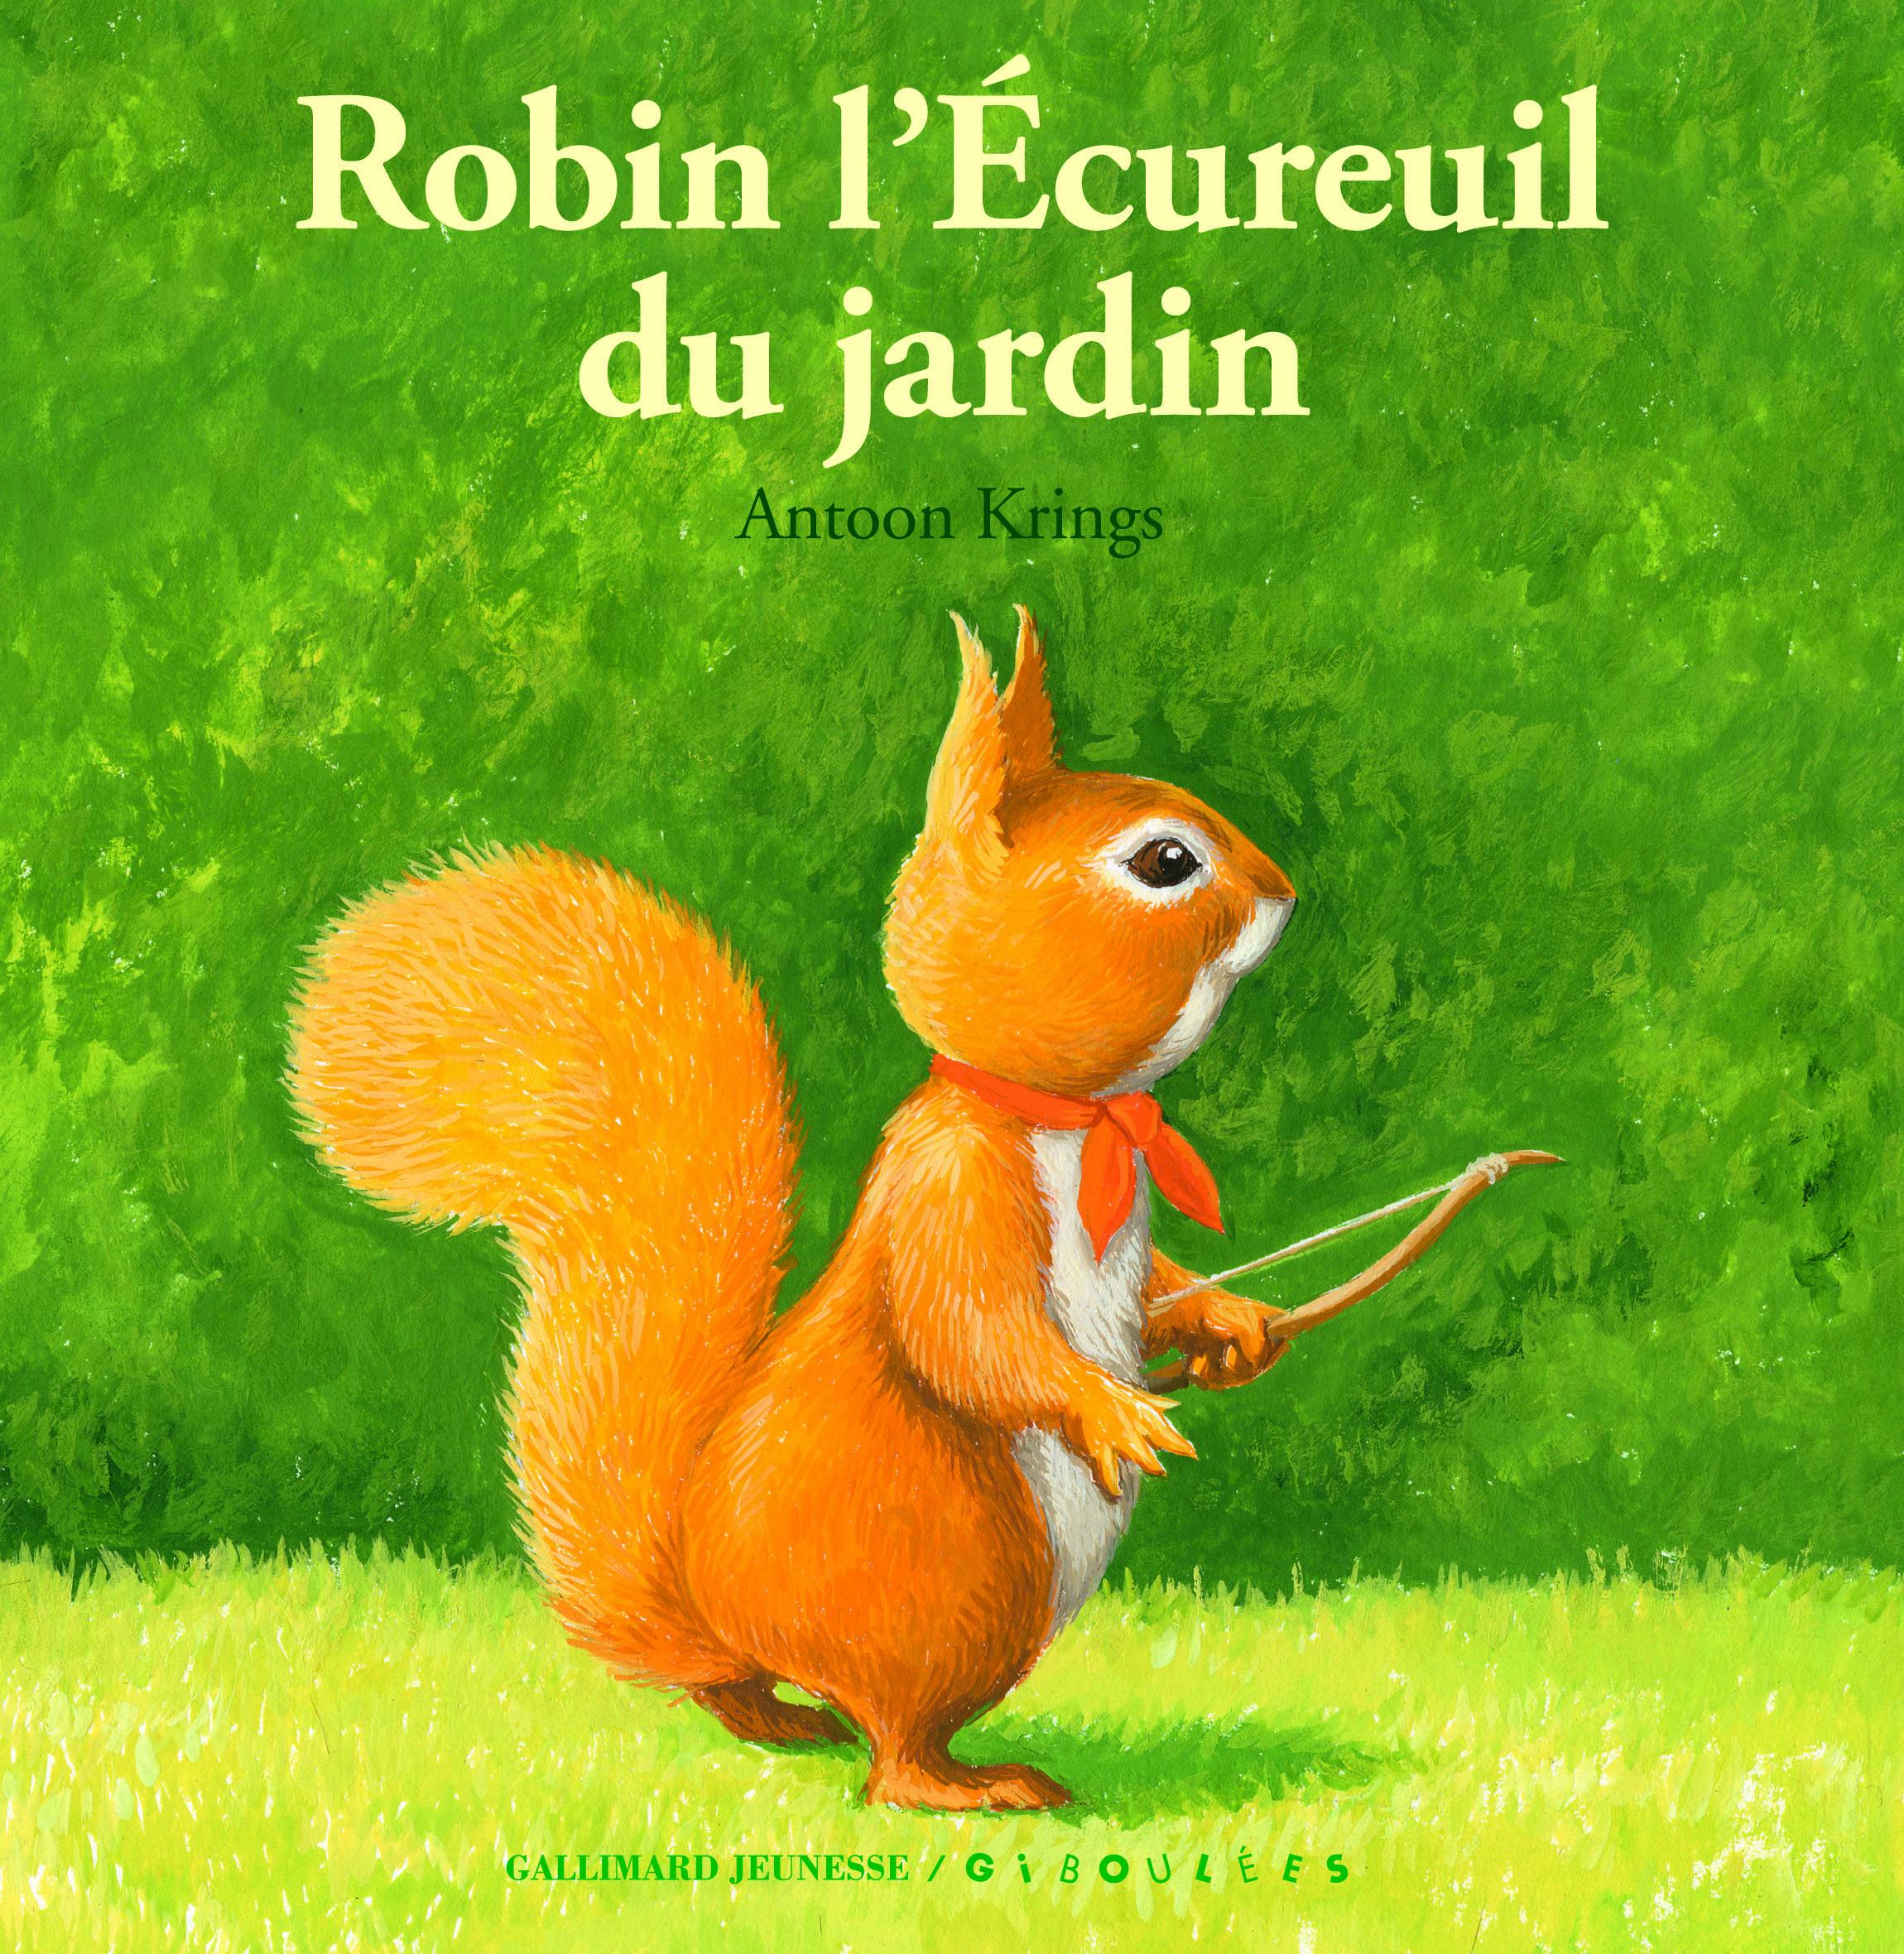 ROBIN L'ECUREUIL DU JARDIN